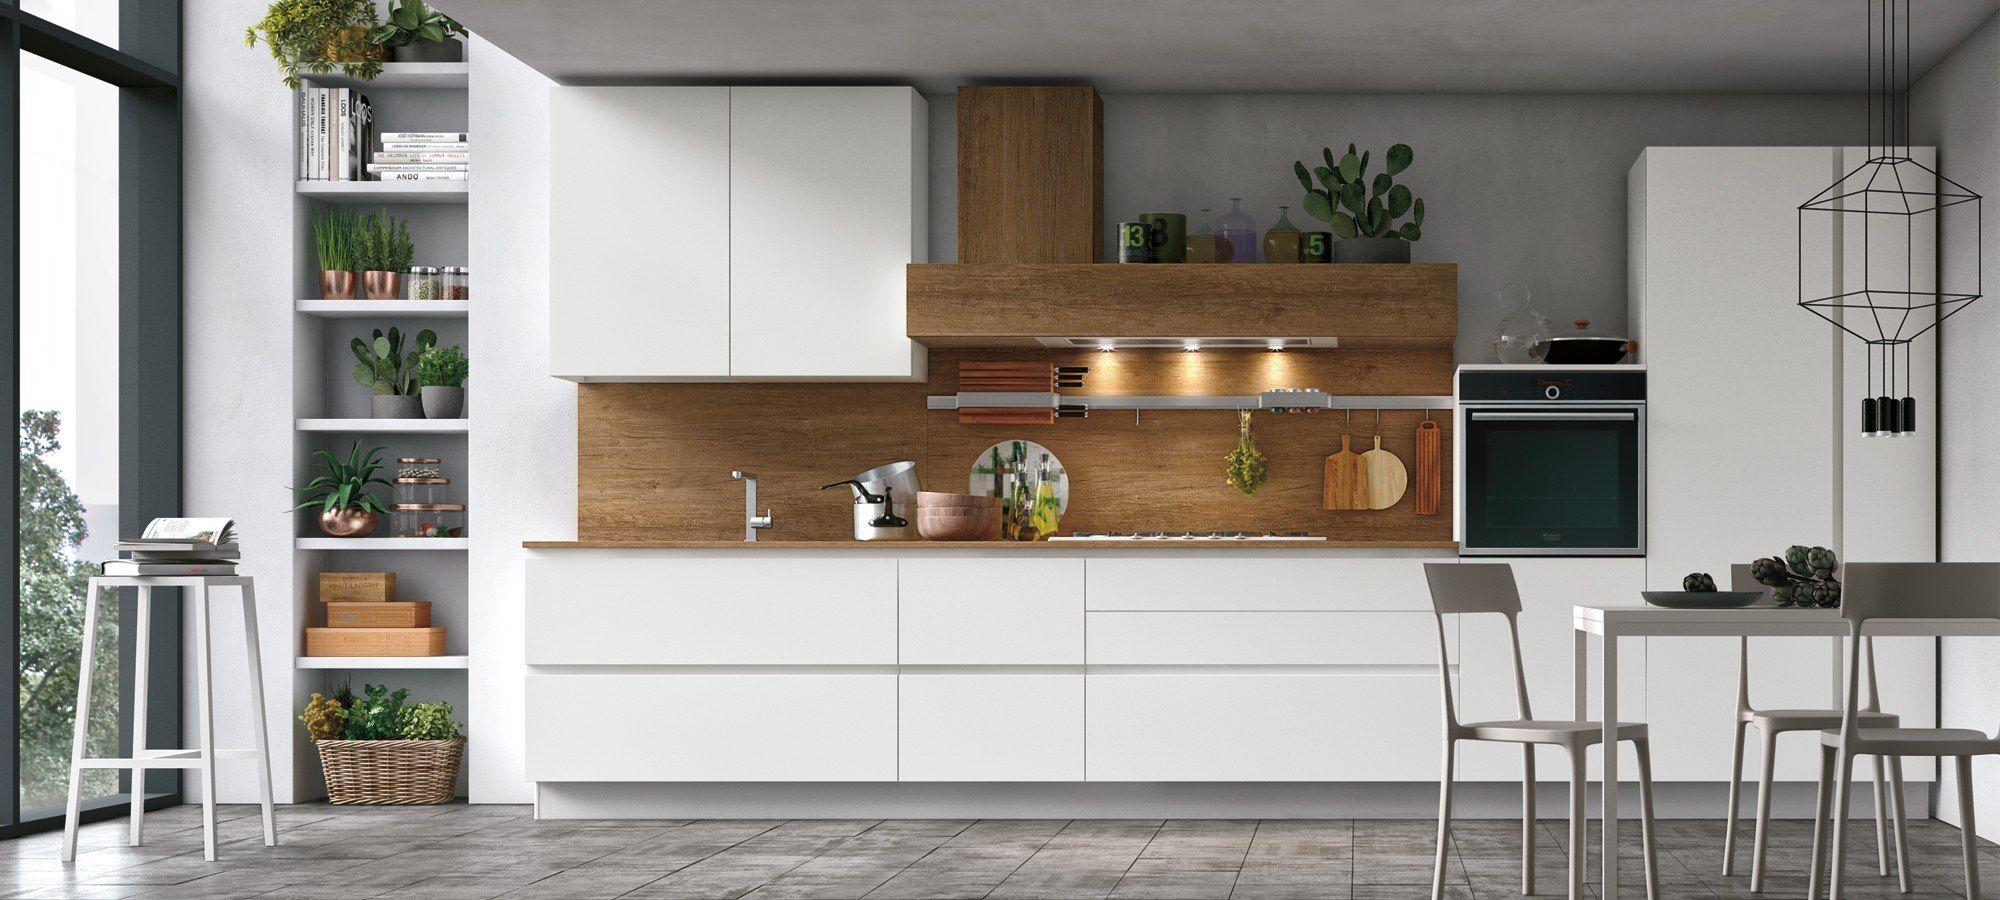 Cucine moderne stosa modello cucina infinity 02 kitchen design nel 2019 kitchen design - Mobili cucina moderna ...